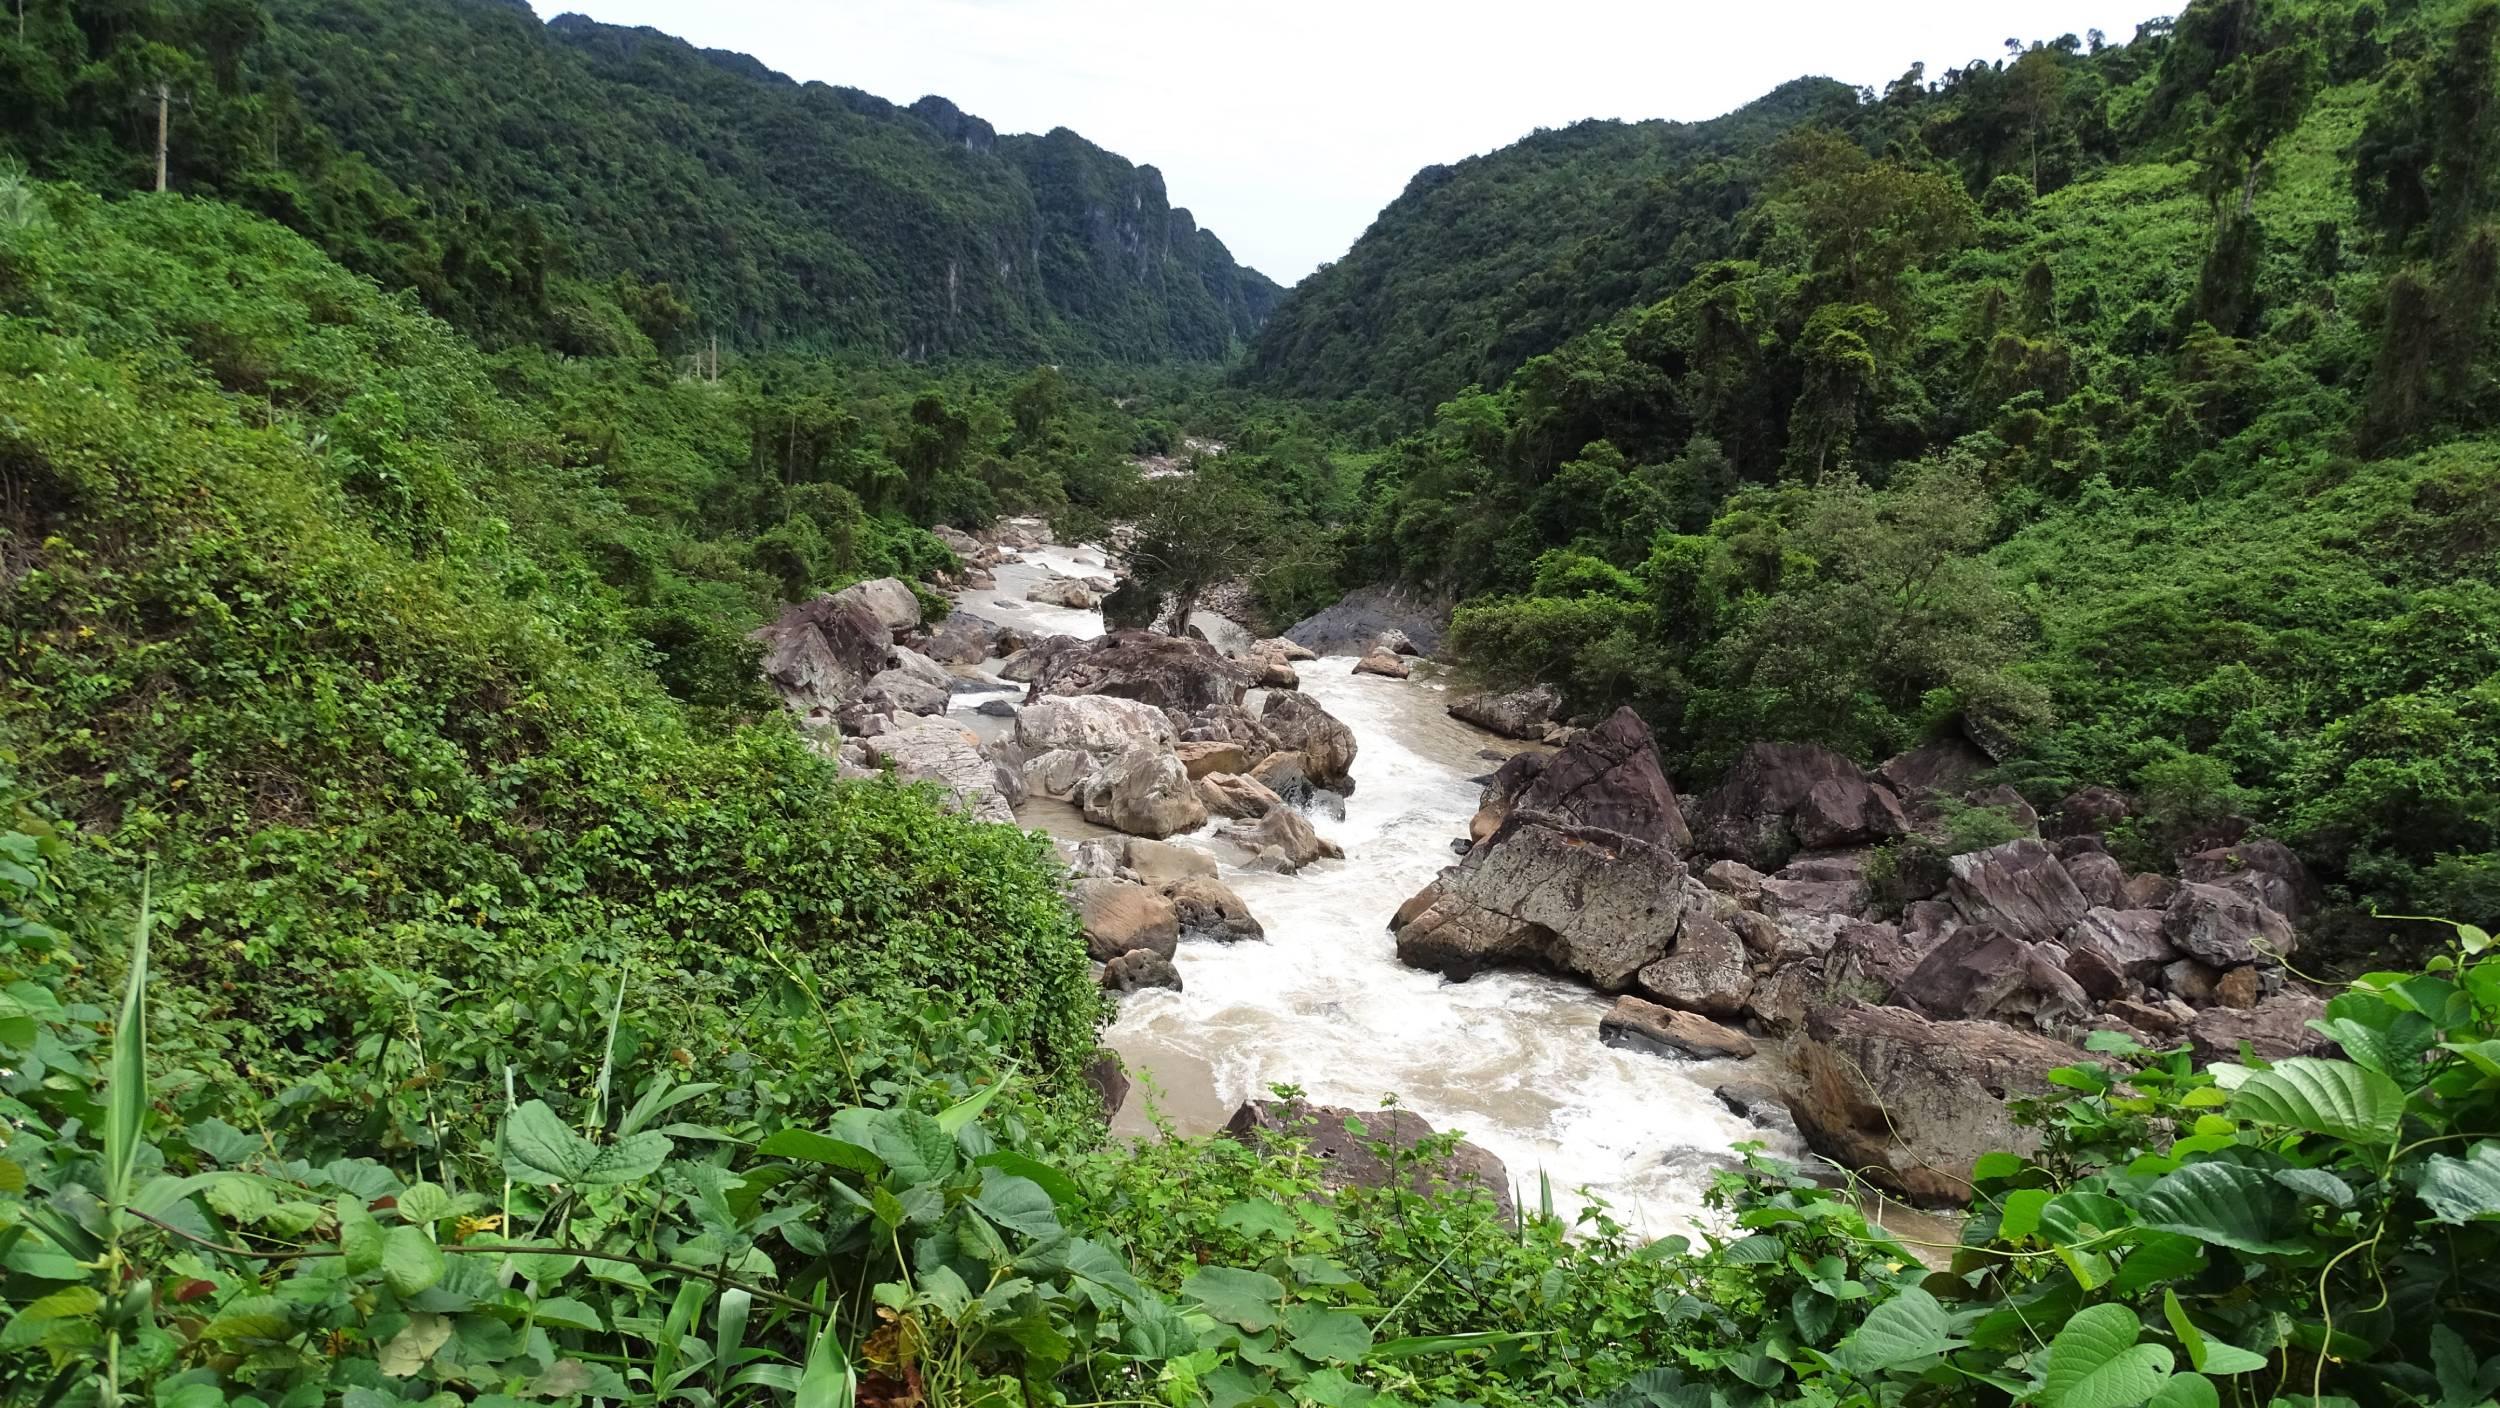 Mountain river flowing through the lush green landscape of Phong Nha Ke Bang National Park